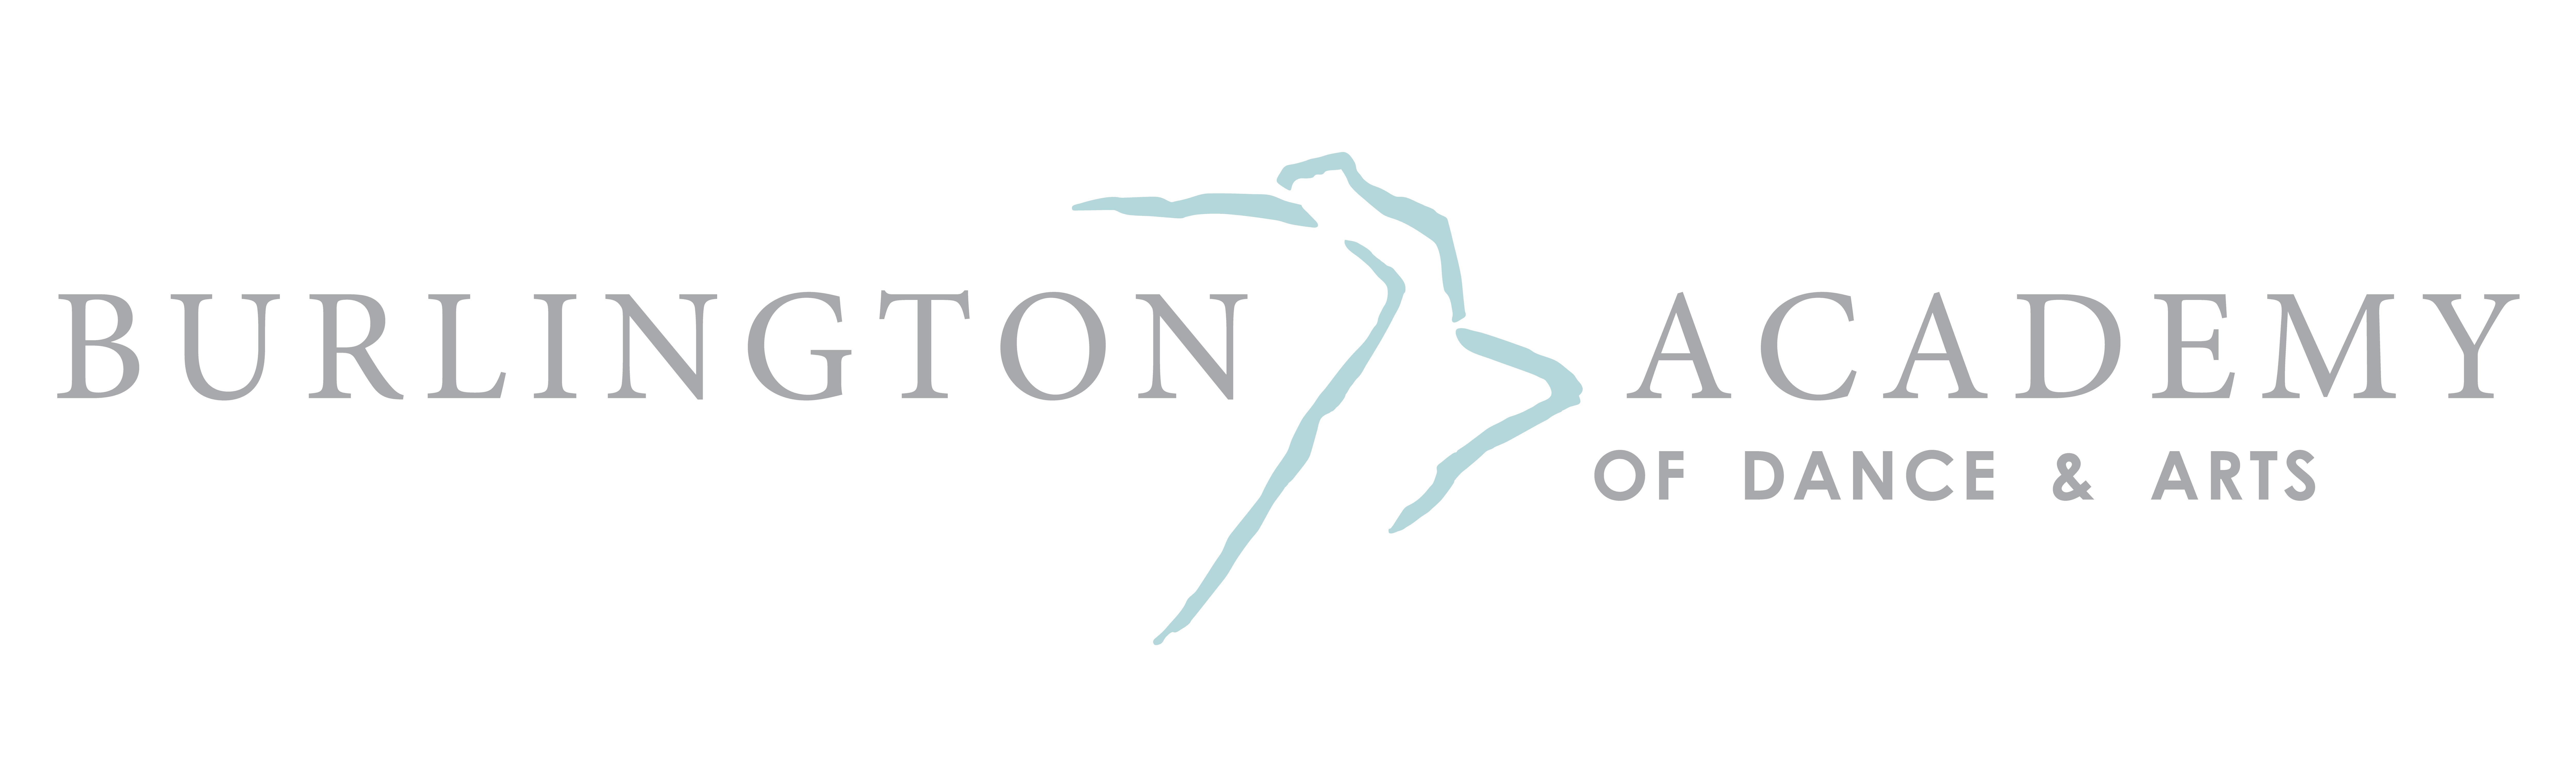 Burlington Academy of Dance & Arts